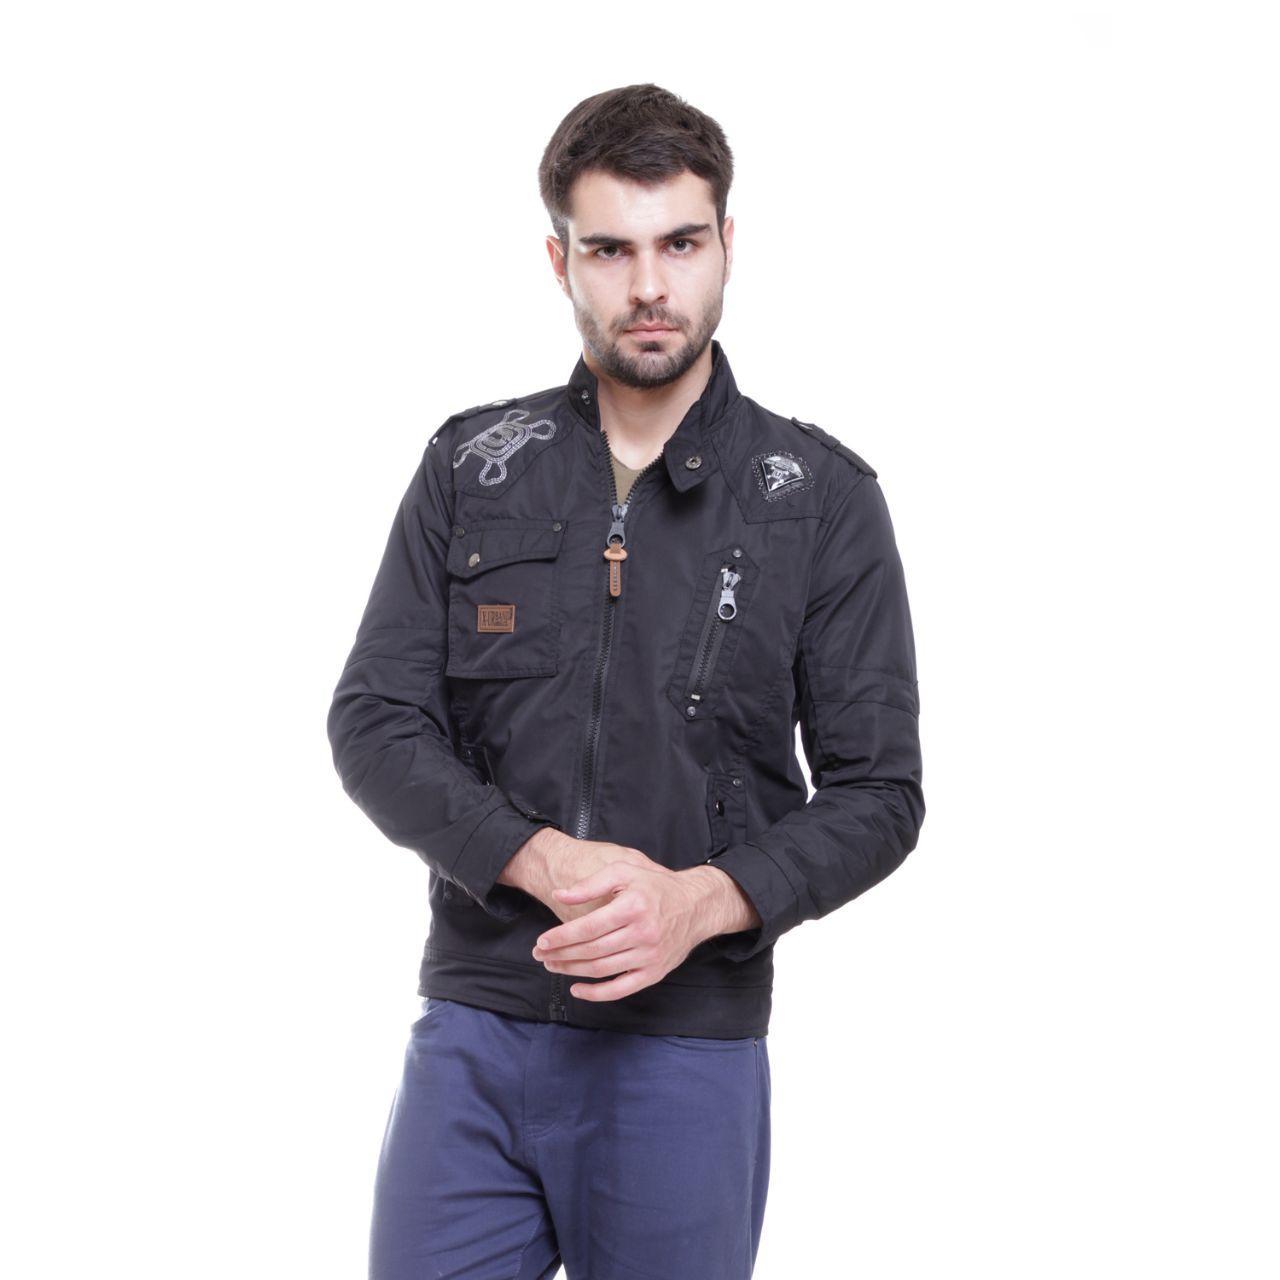 Jaket pria terlaris urband terbuat dari bahan parasut mayer puring fleece